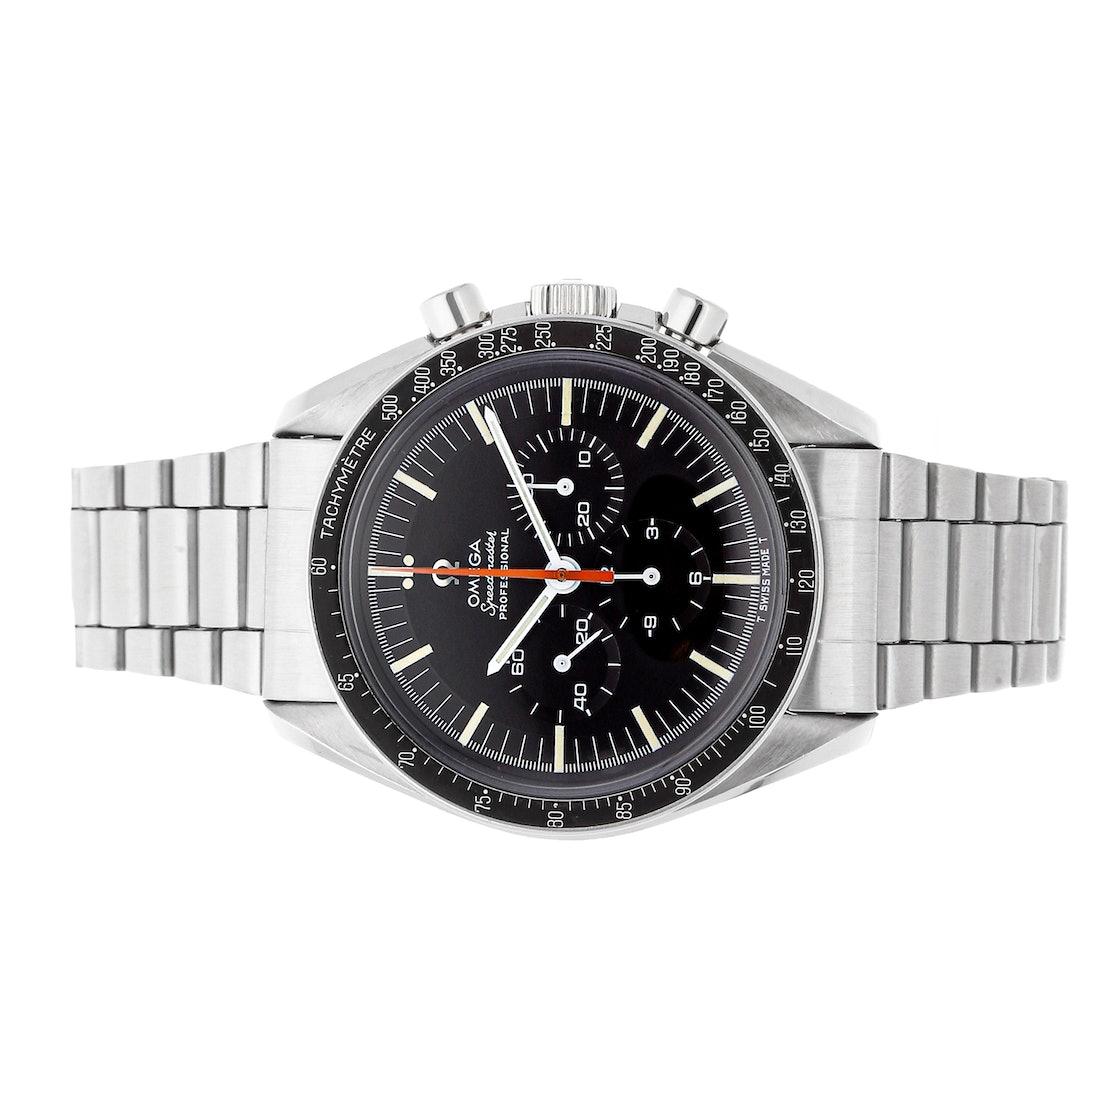 "Omega Vintage Speedmaster Professional Chronograph ""Ultraman"" 145.012"